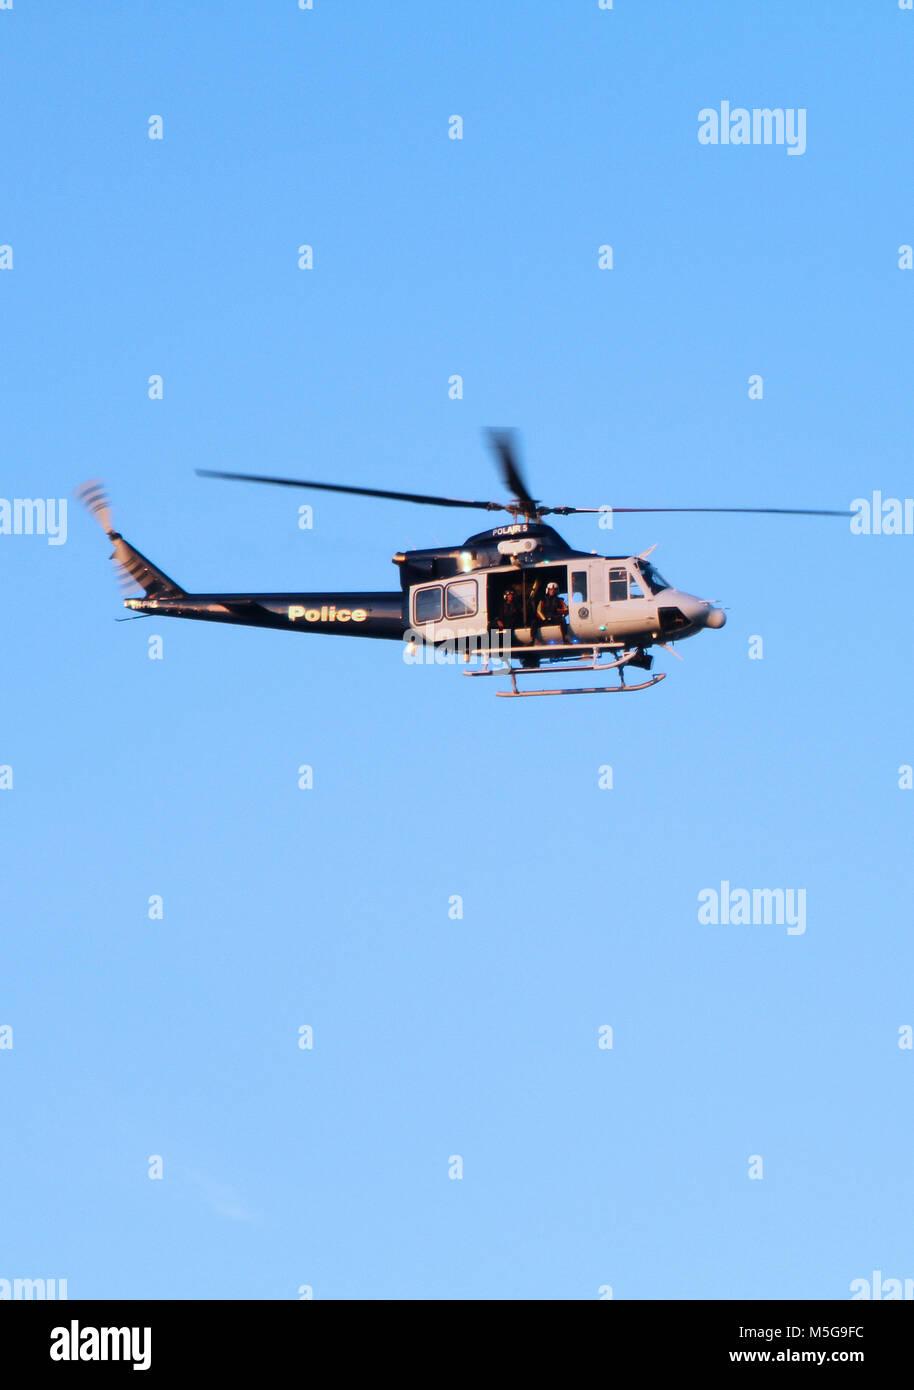 Sydney Harbour police patrol helicopter, Australia Stock Photo